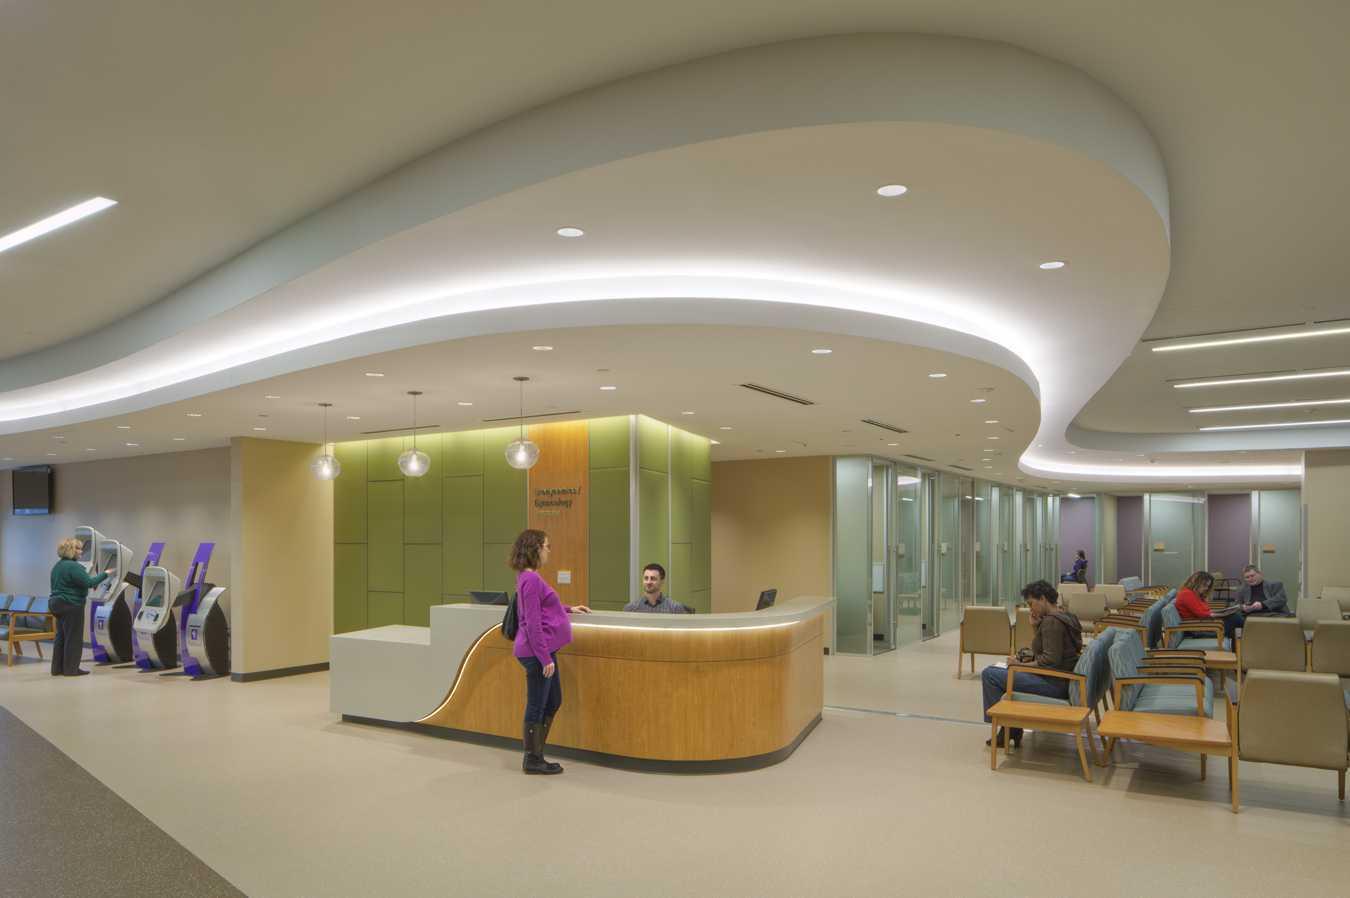 5G Studio Collaborative Parkland Hospital Wish Clinic Dallas, Texas Dallas, Texas Information Area   22472